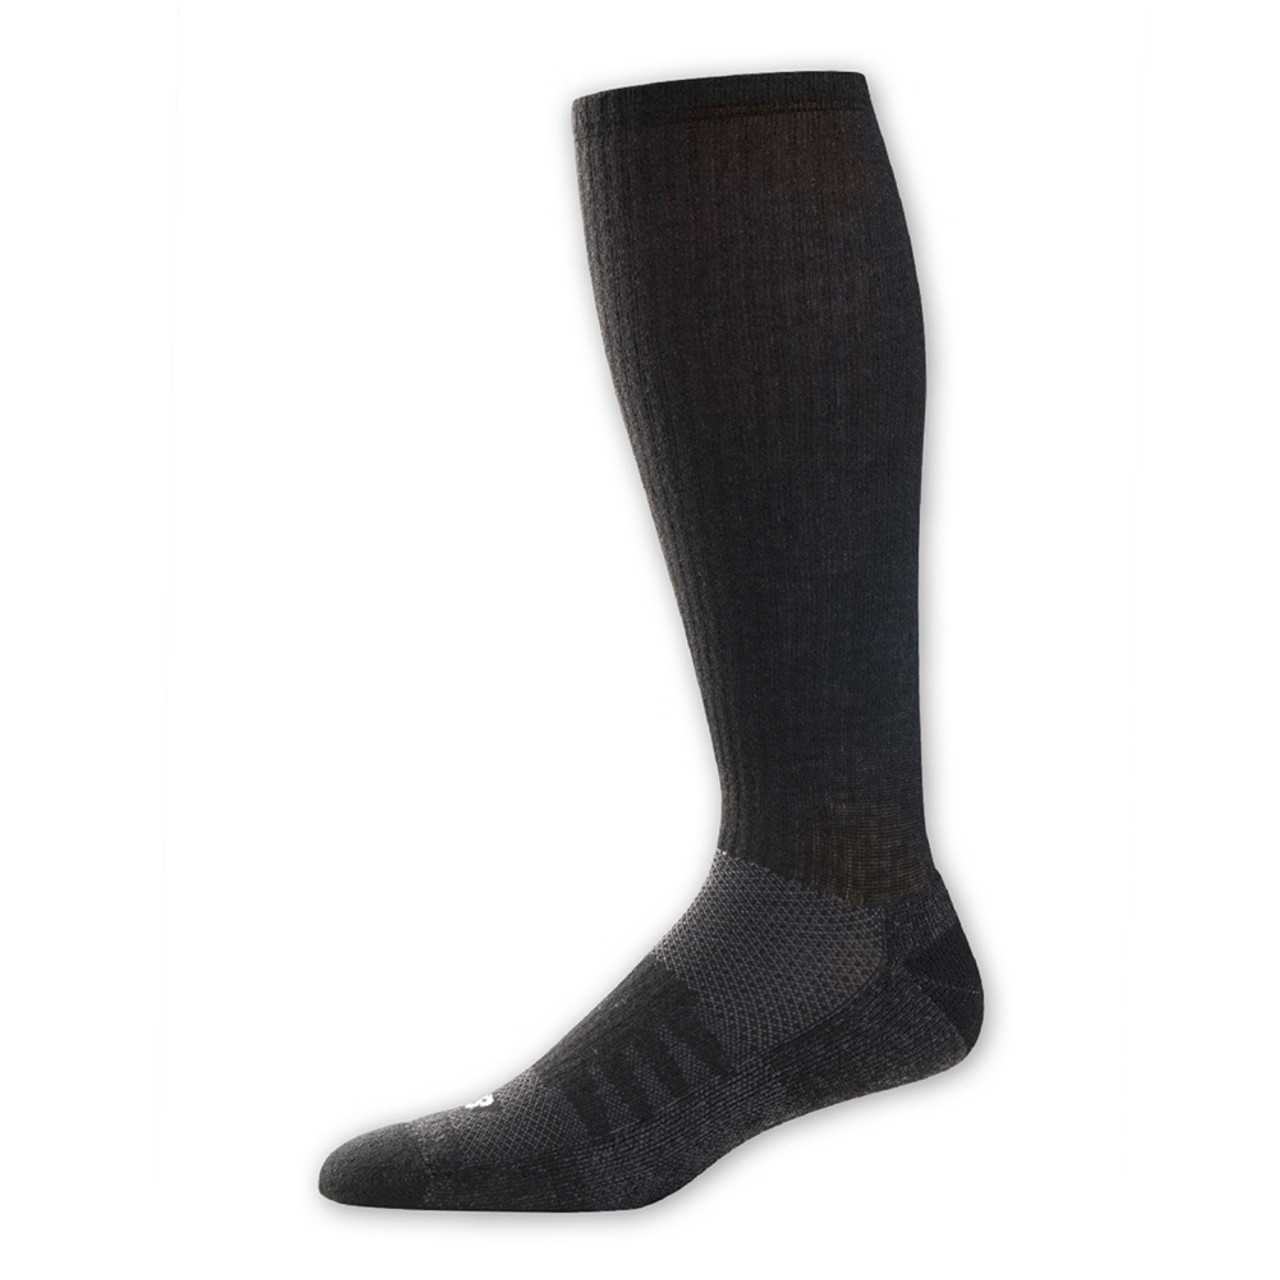 bc35247e49c7a New Balance Unisex 2 Pack Wellness Casual Walker Over The Calf Socks Black  - Shop now